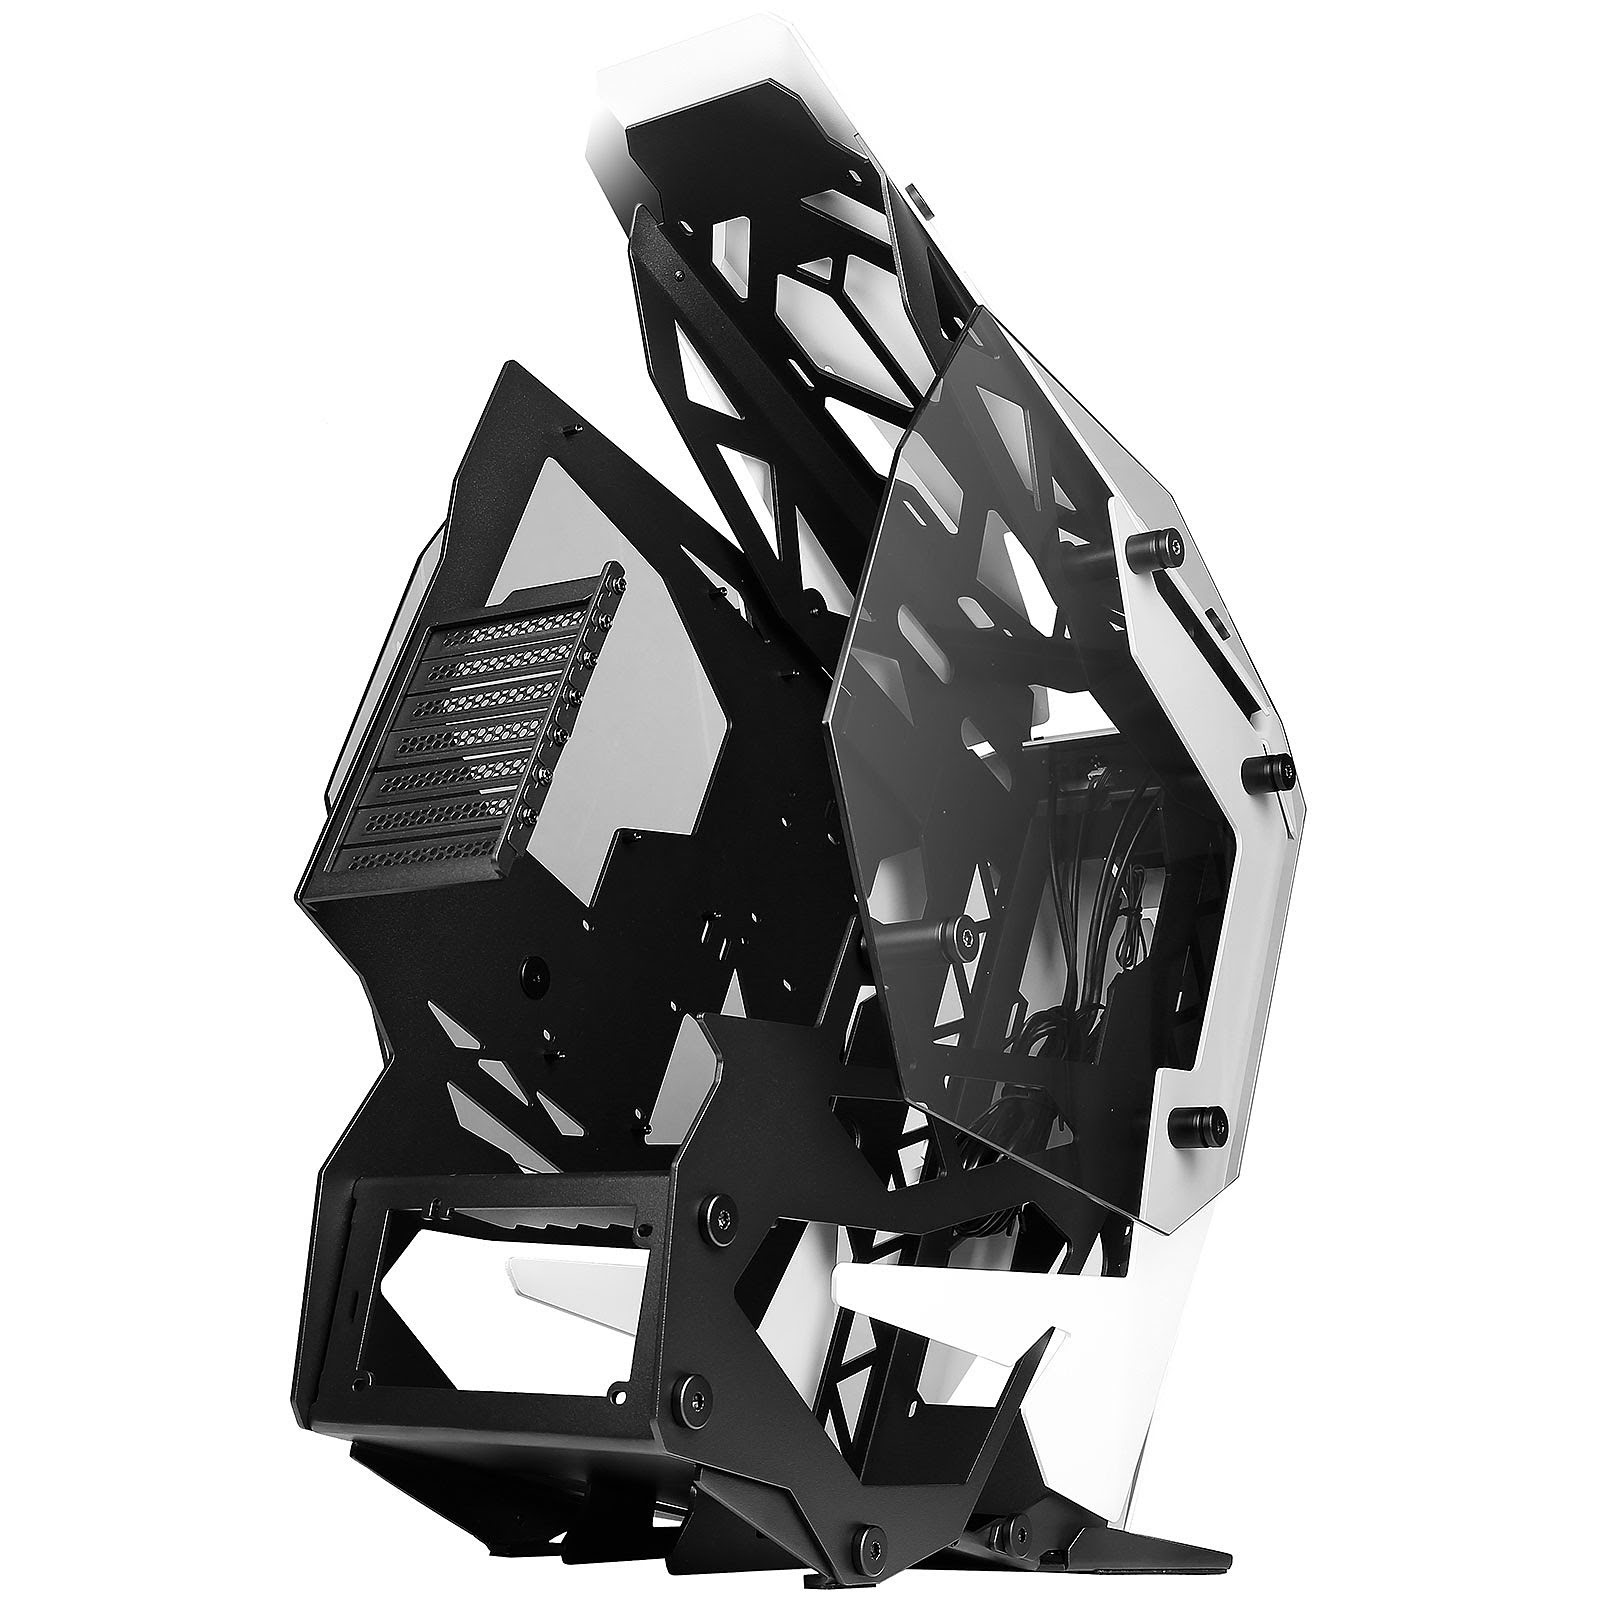 Antec TORQUE Black/White Blanc - Boîtier PC Antec - Cybertek.fr - 2